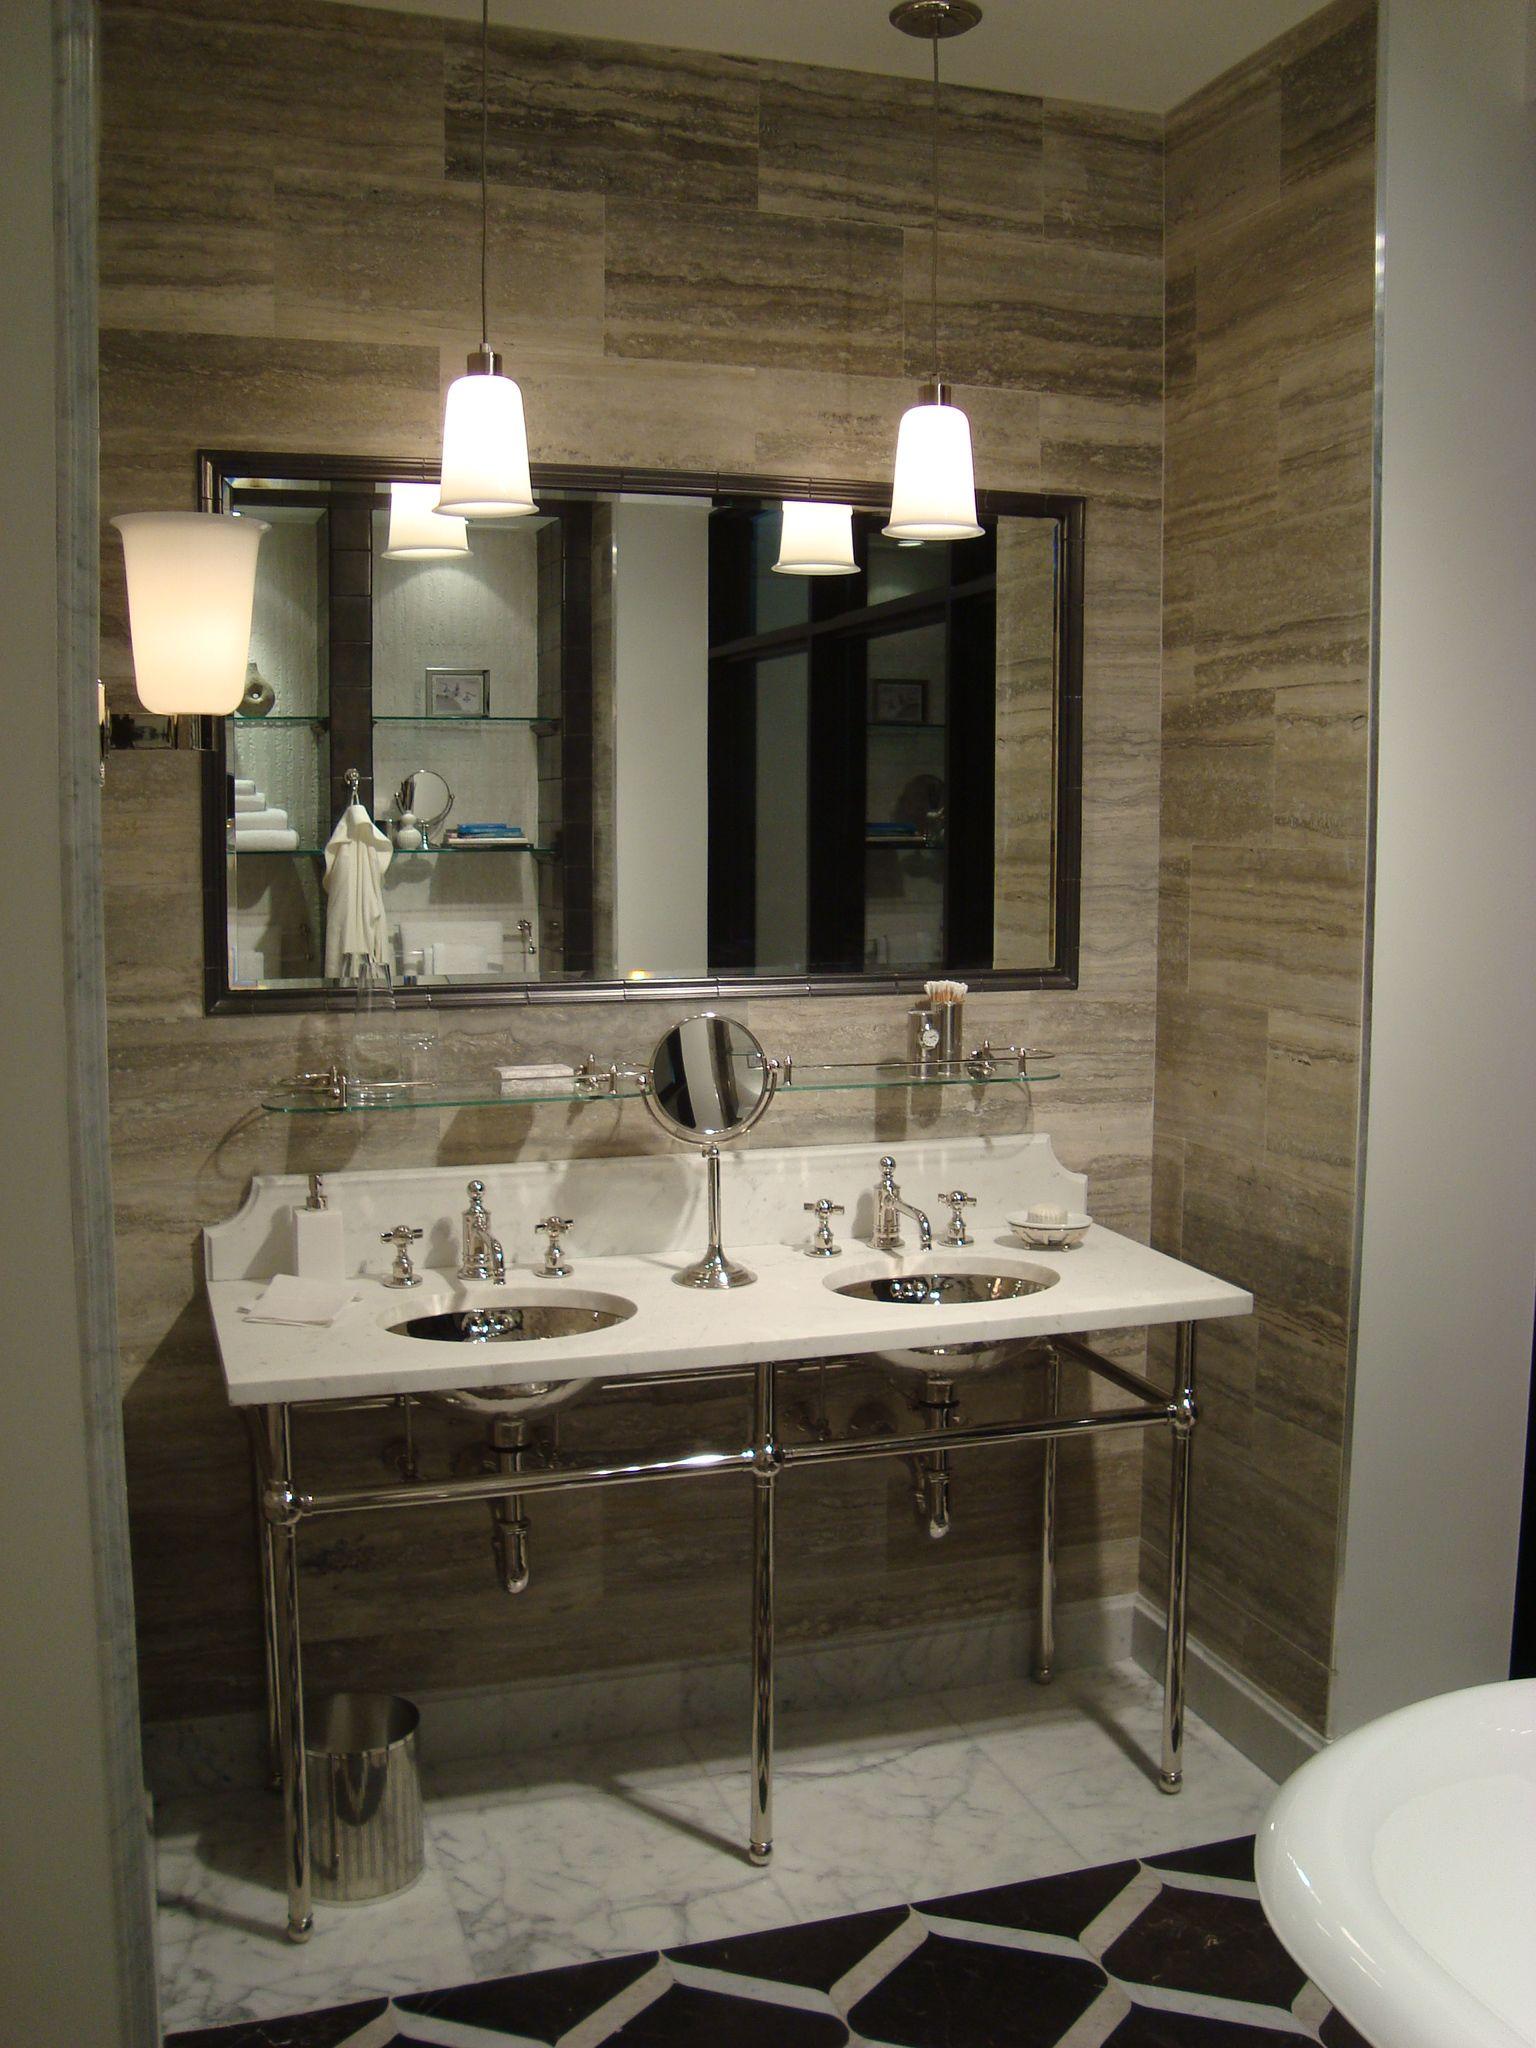 Bathroom display in the miami showroom miami showroom for Bathroom showrooms los angeles